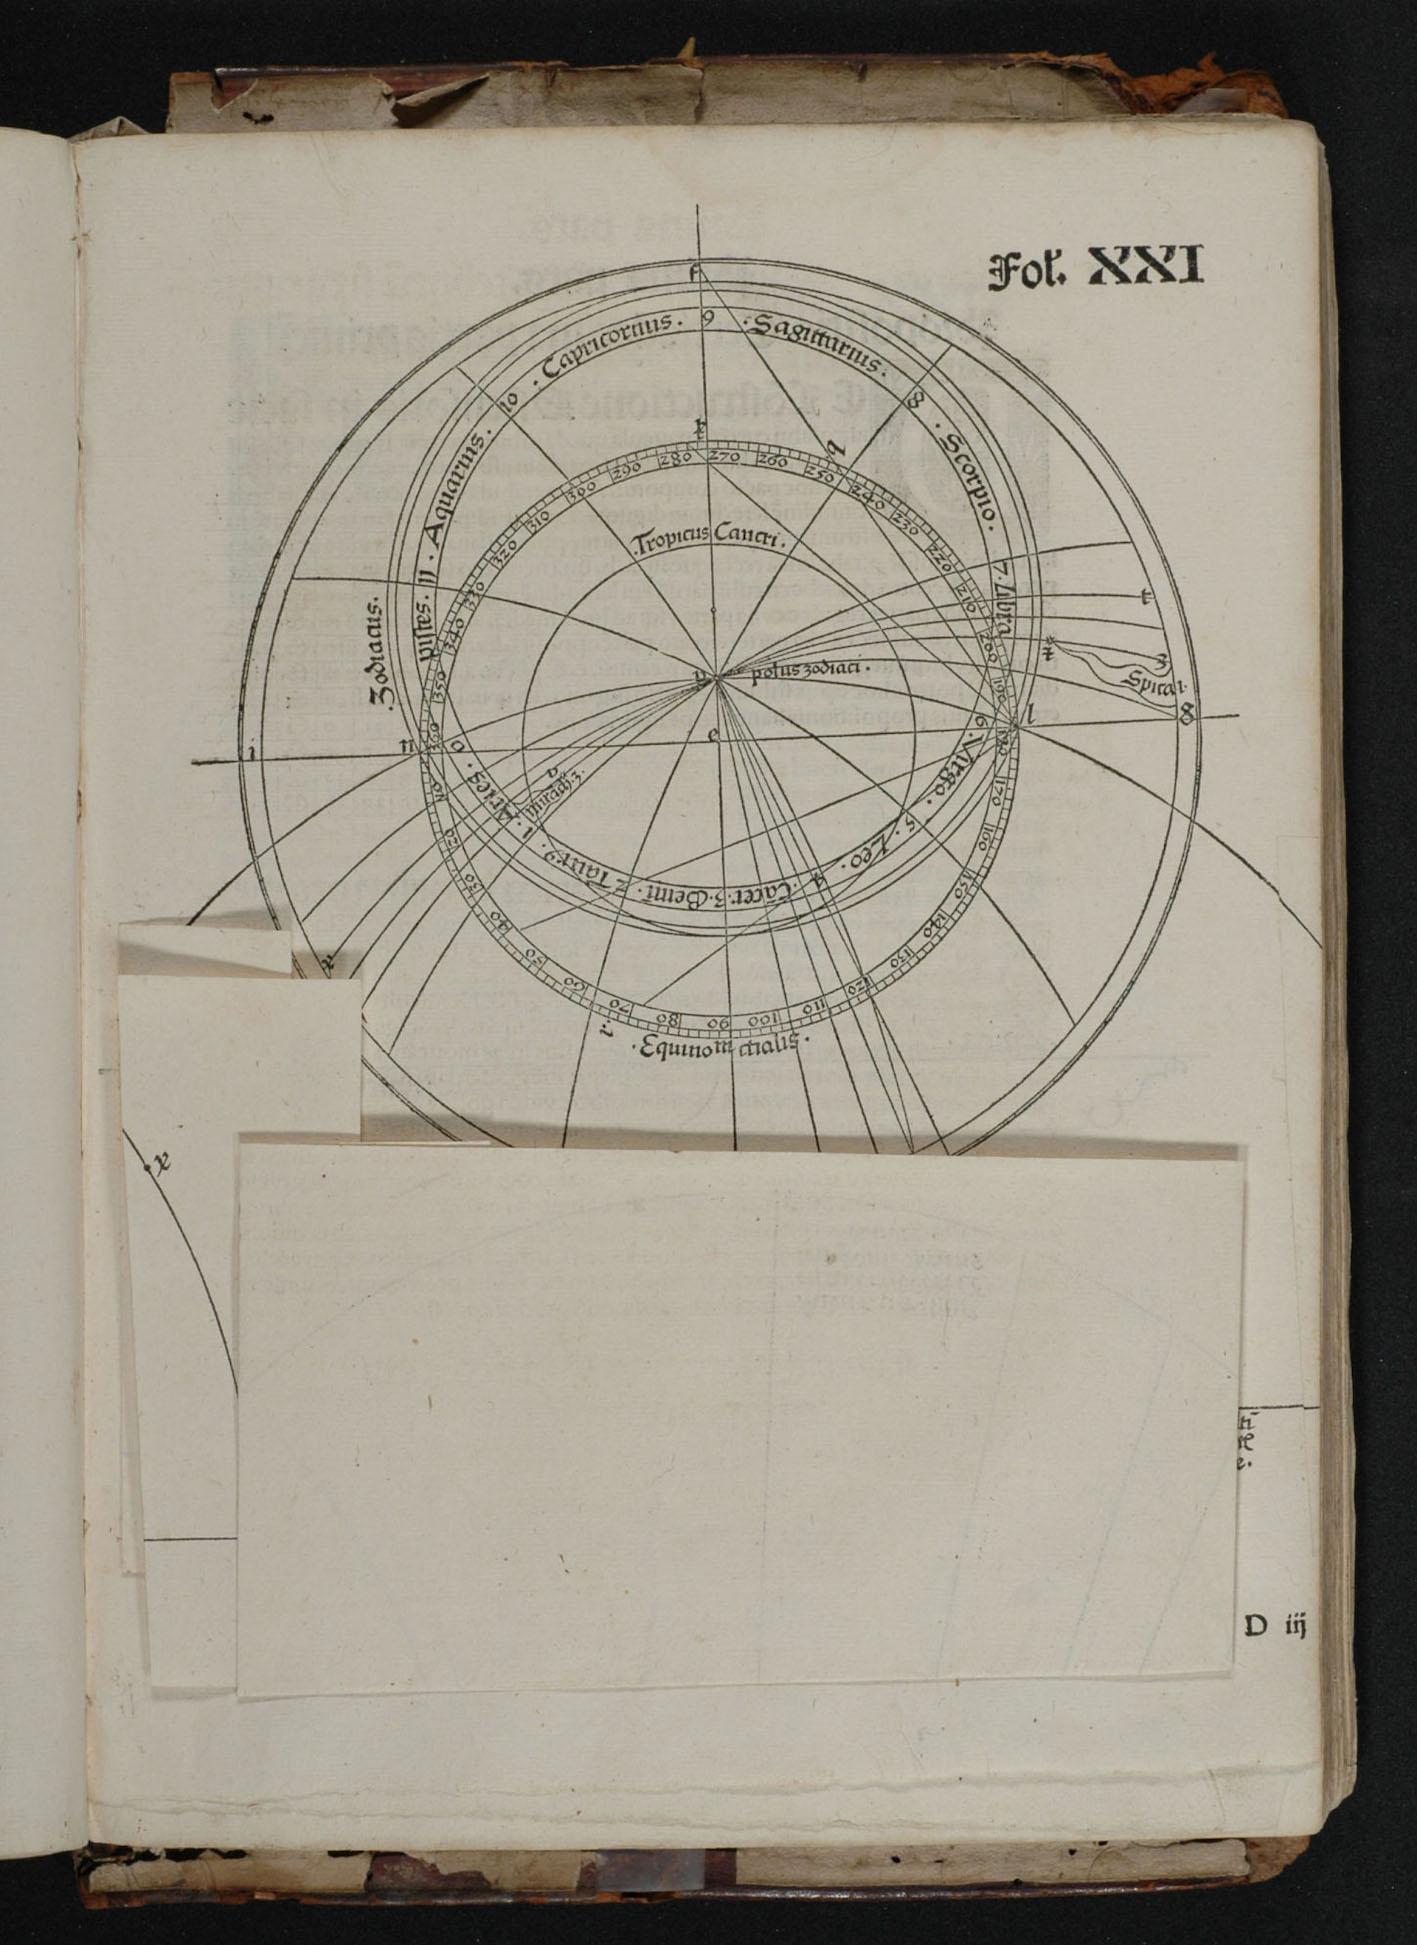 """J. Stöffler, Elucidatio, 1513, fol. 21r, folded page."""